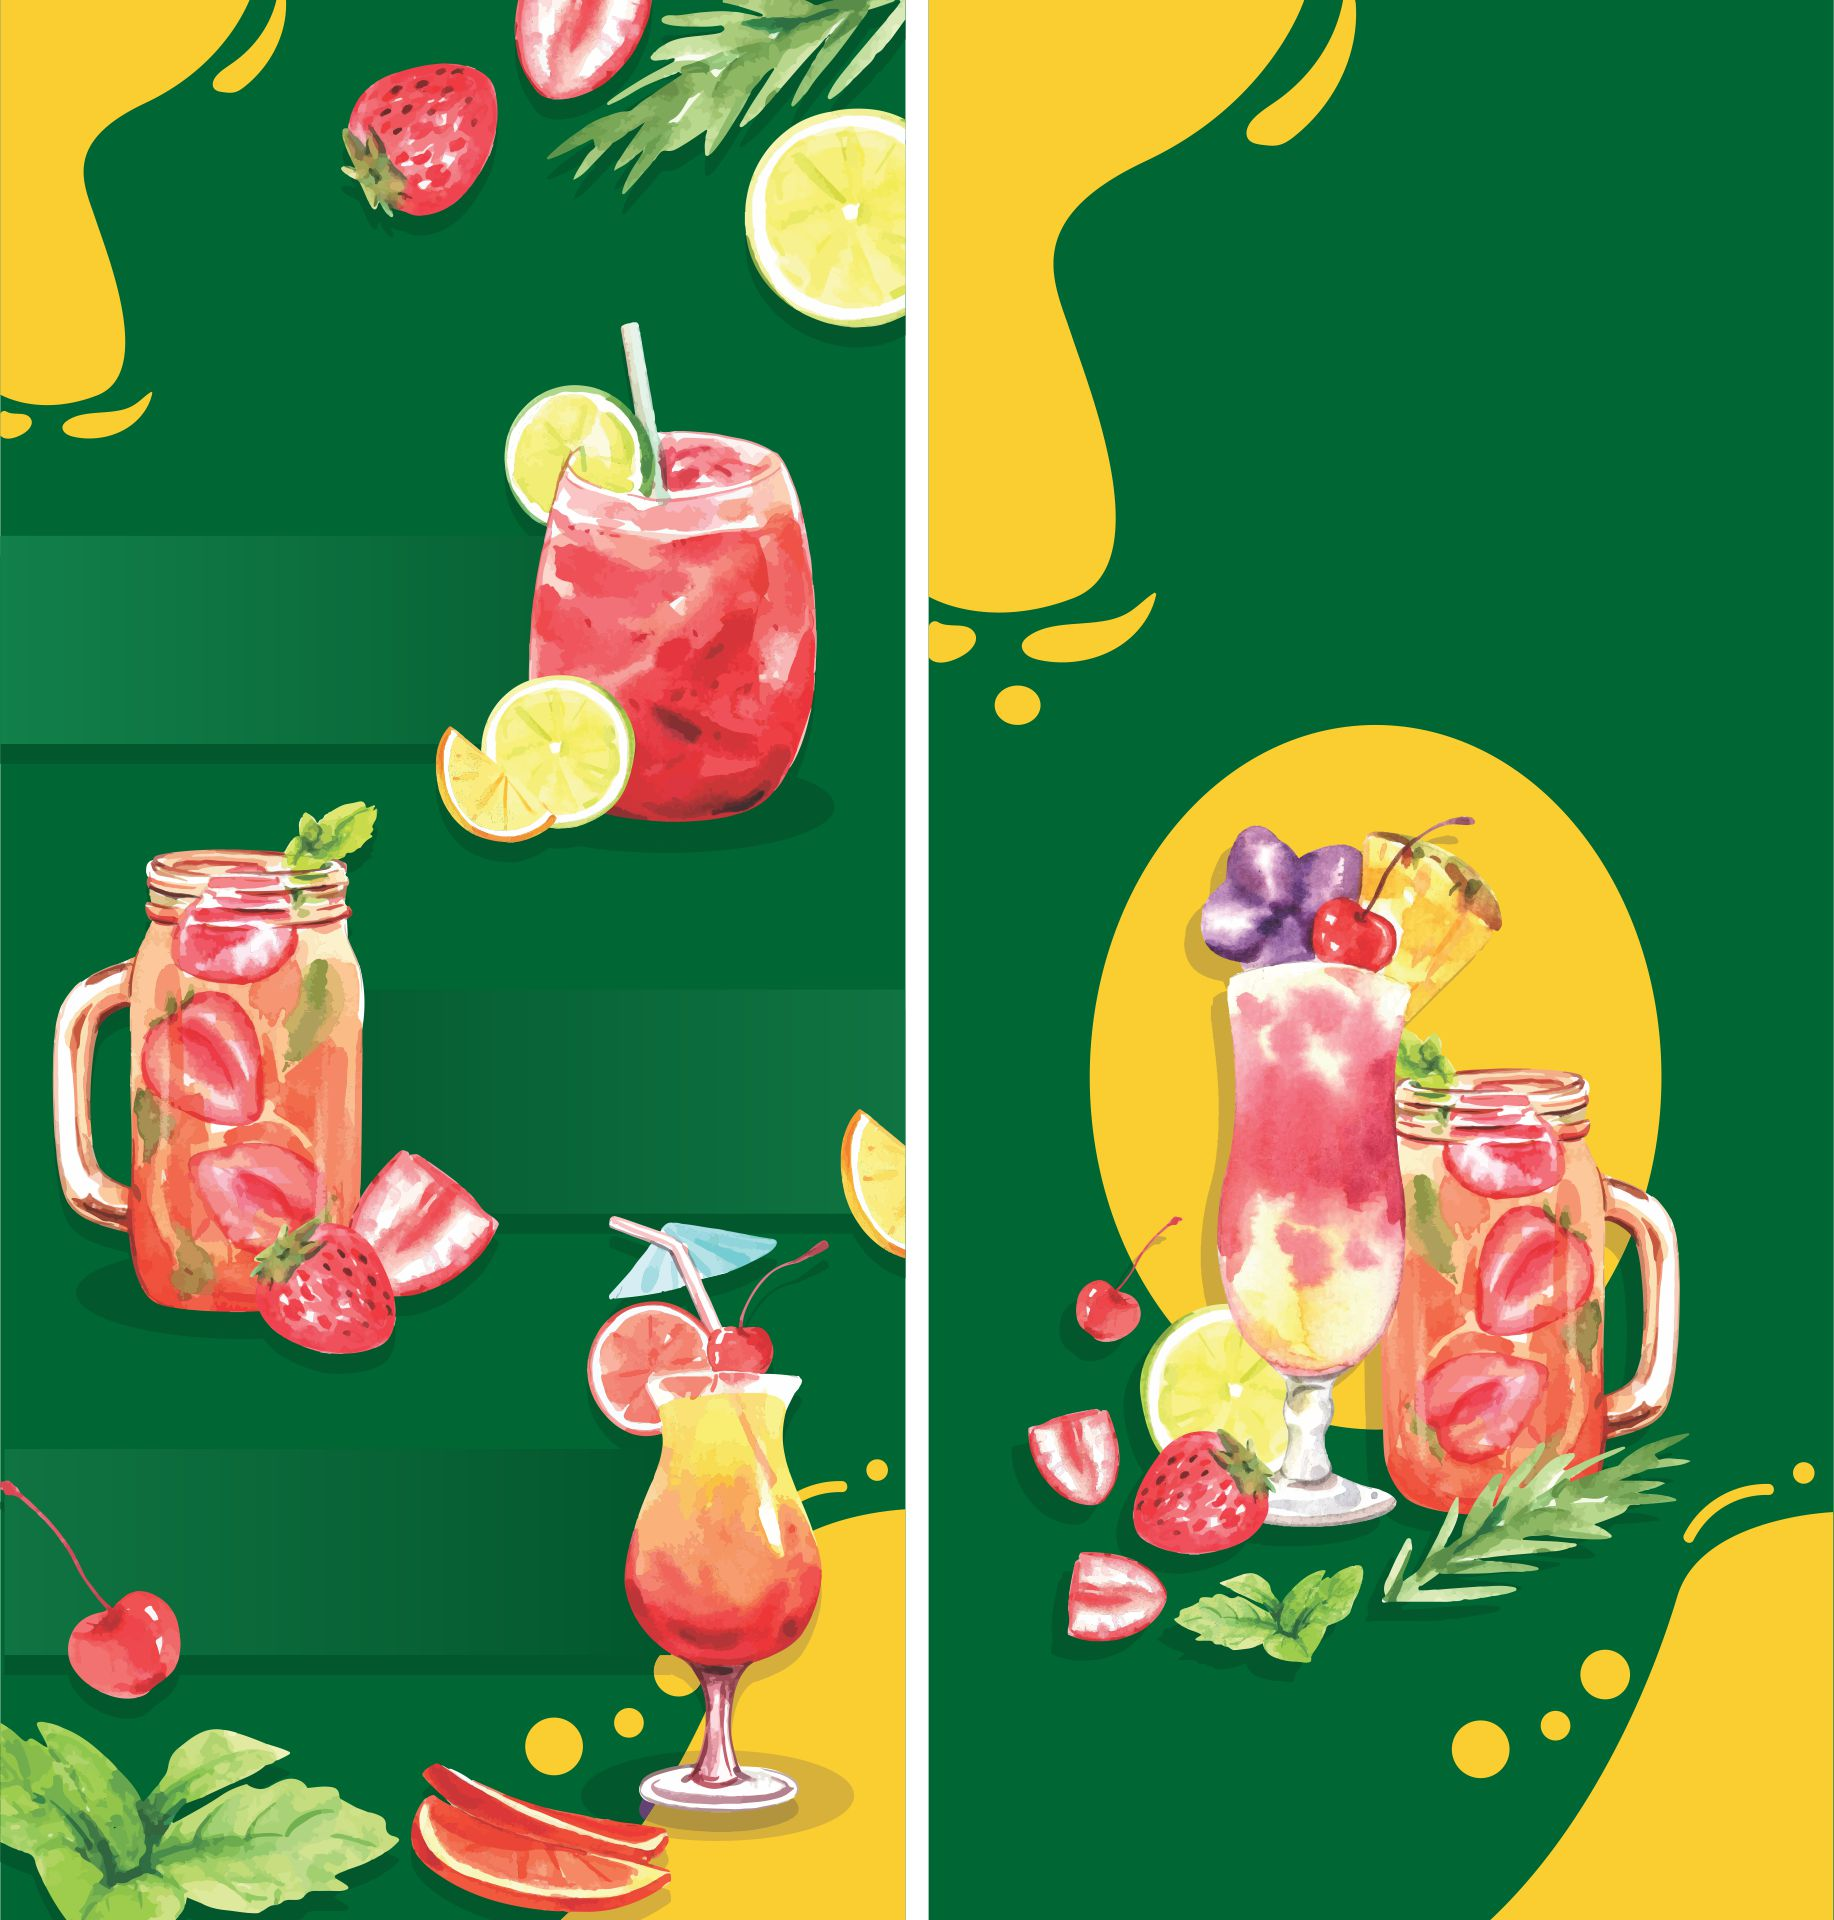 Fruits And Vegetables Brochure Design Template